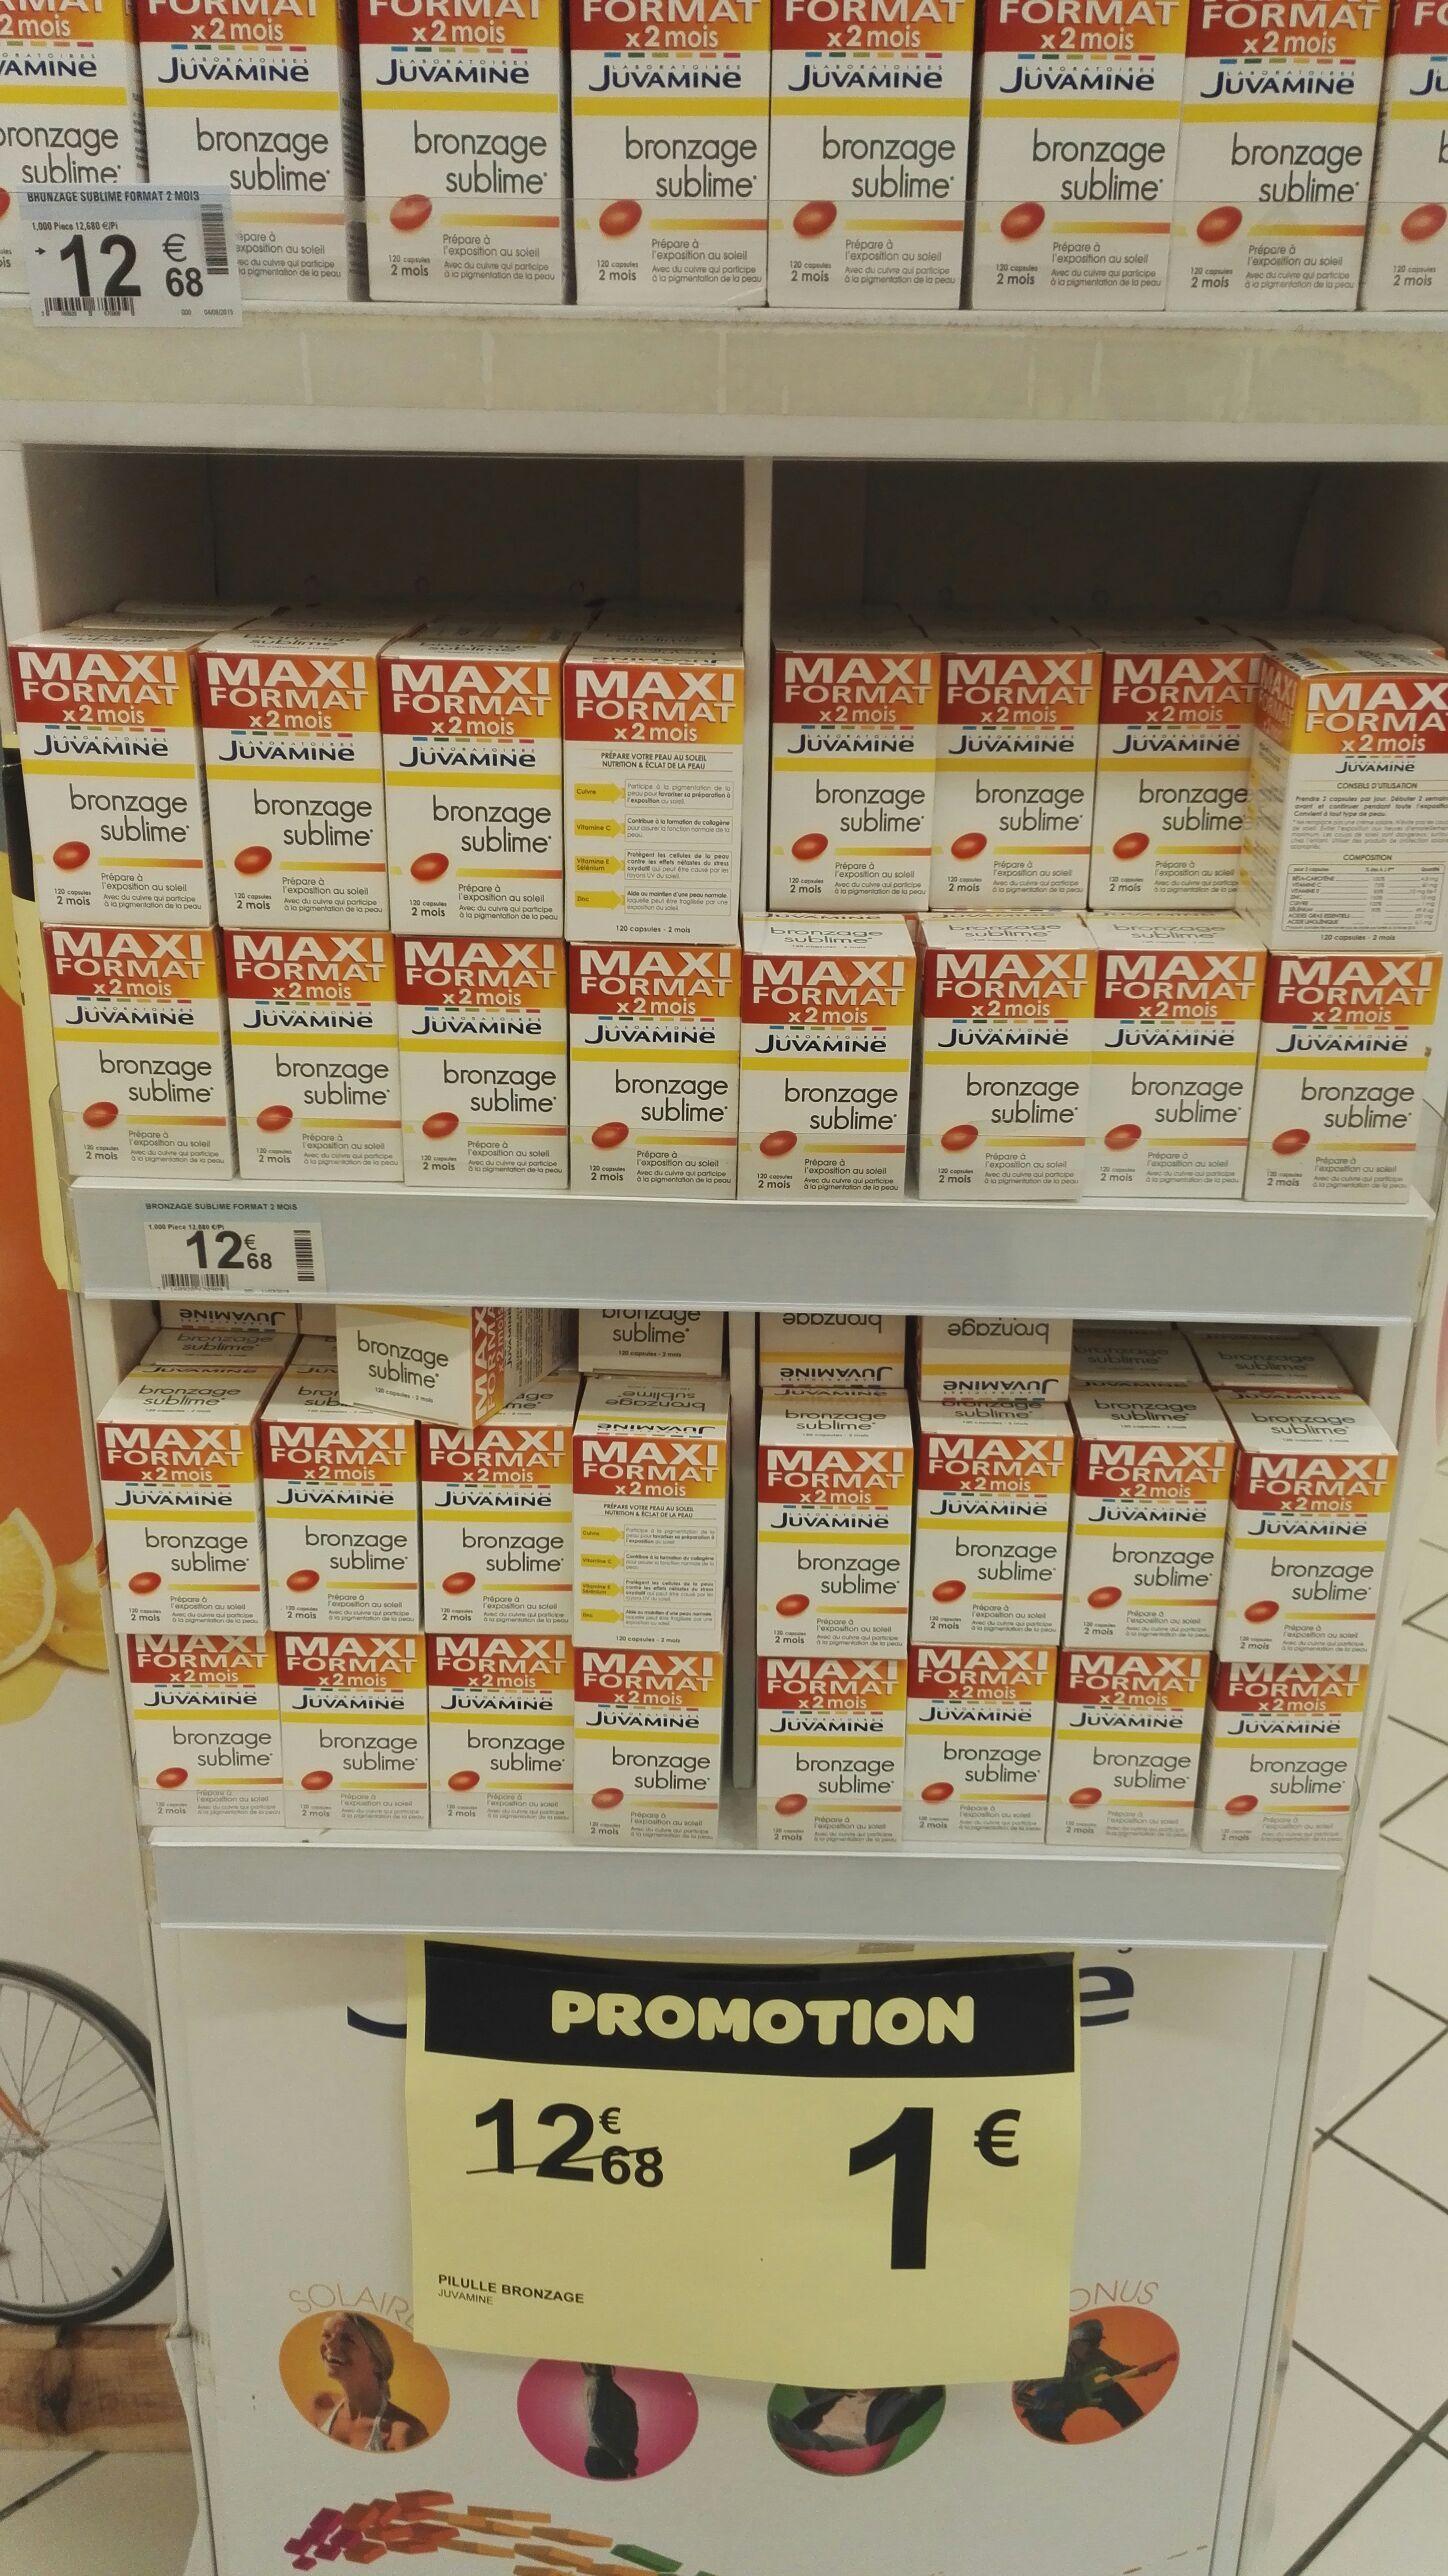 Boite Juvamine Bronzage Sublime Maxi format 2 mois (120 capsules)